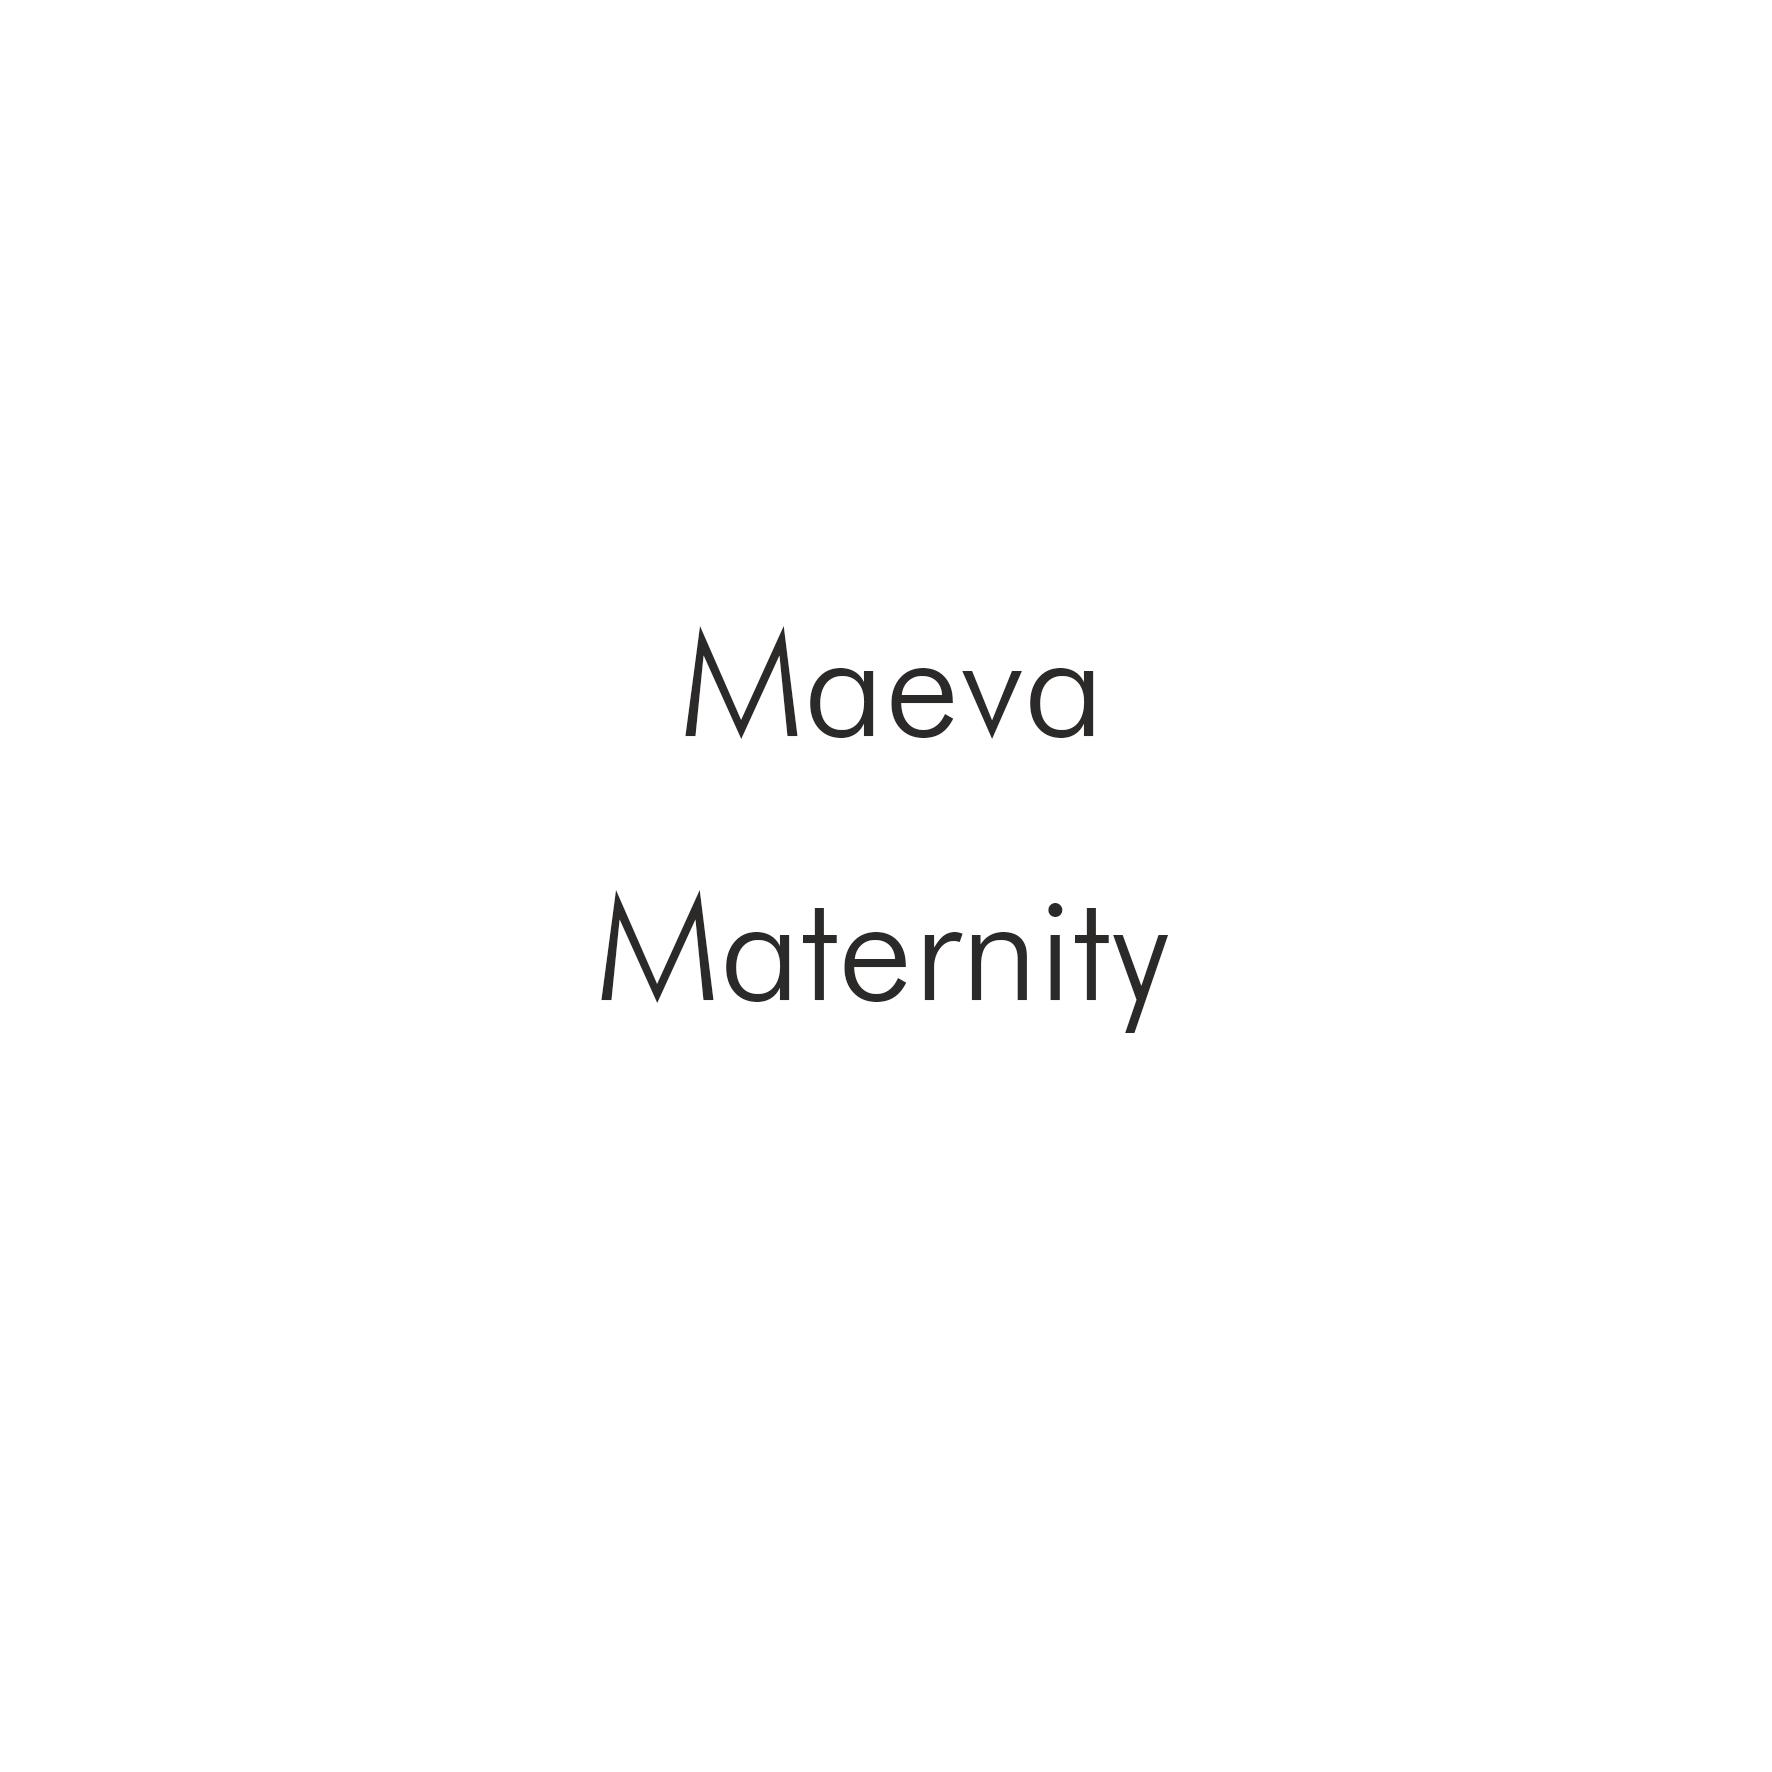 Maeva Maternity.png